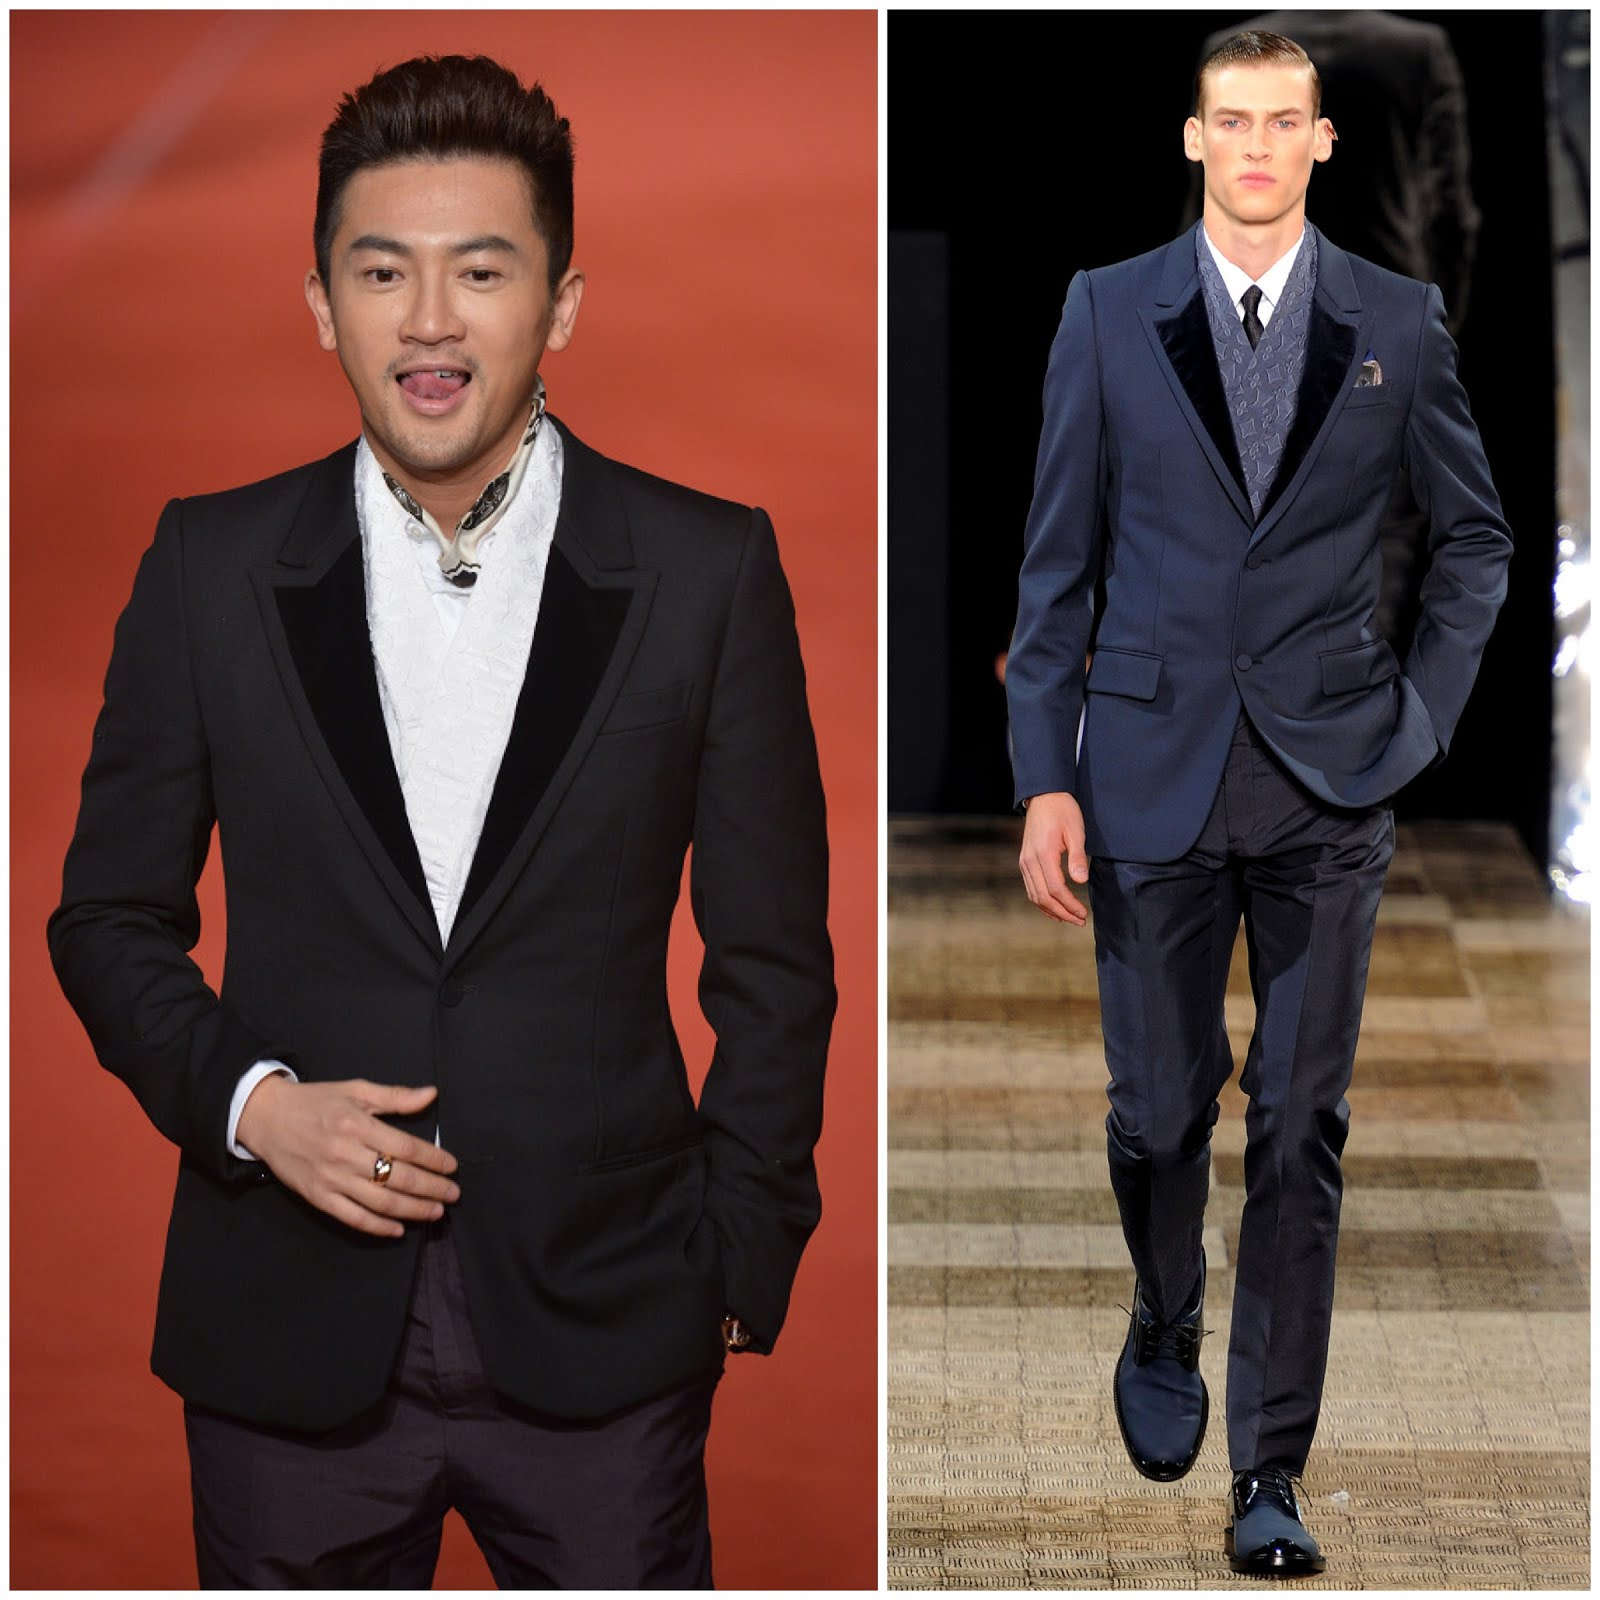 00O00 London Menswear Blog Celebrity Style Alec Su Youpeng in Louis Vuitton - 49th Golden Horse Awards [苏有朋盛装出席第49届台湾电影金马奖颁奖礼, 身穿路易威登晚礼服]